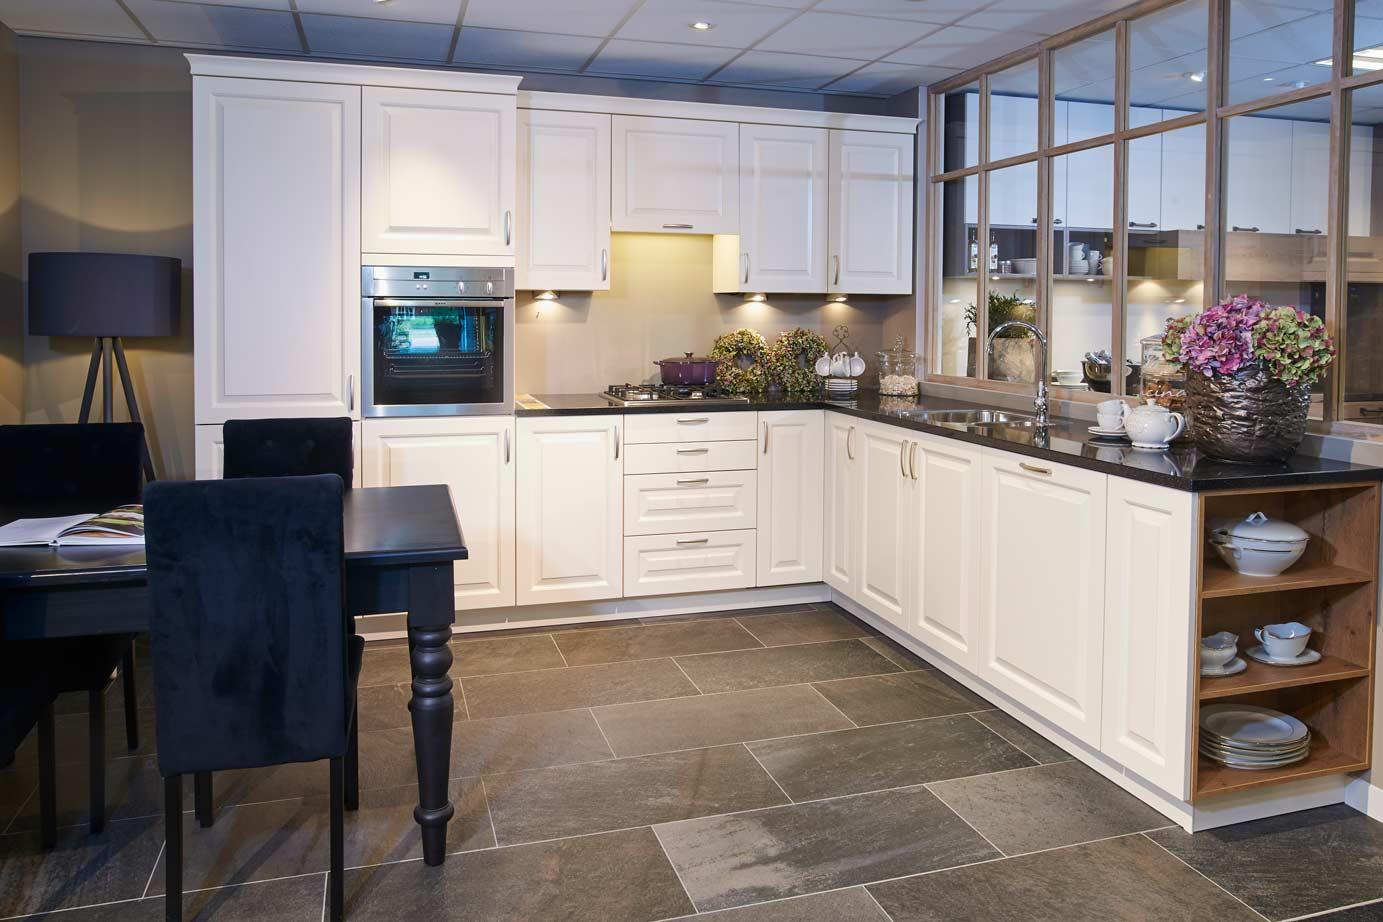 Klassieke keuken met compleet set neff apparatuur db keukens